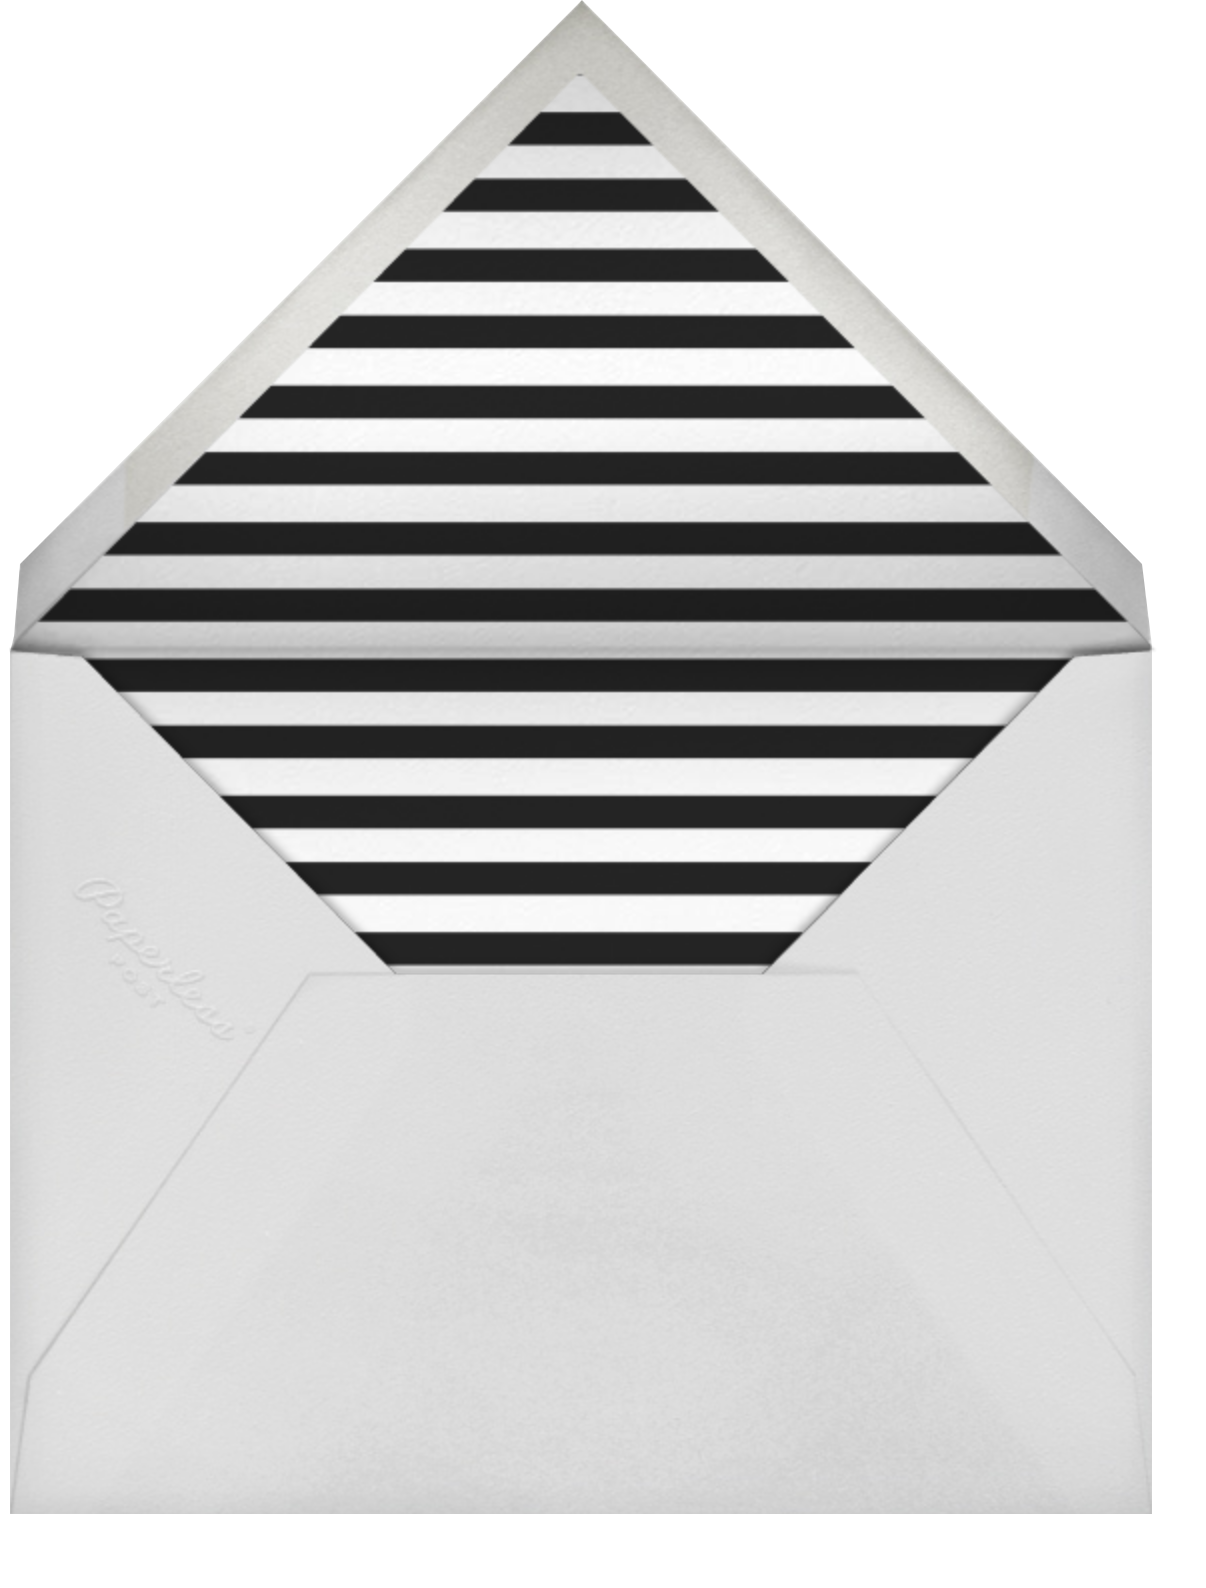 Colbrand - Paperless Post - Envelope